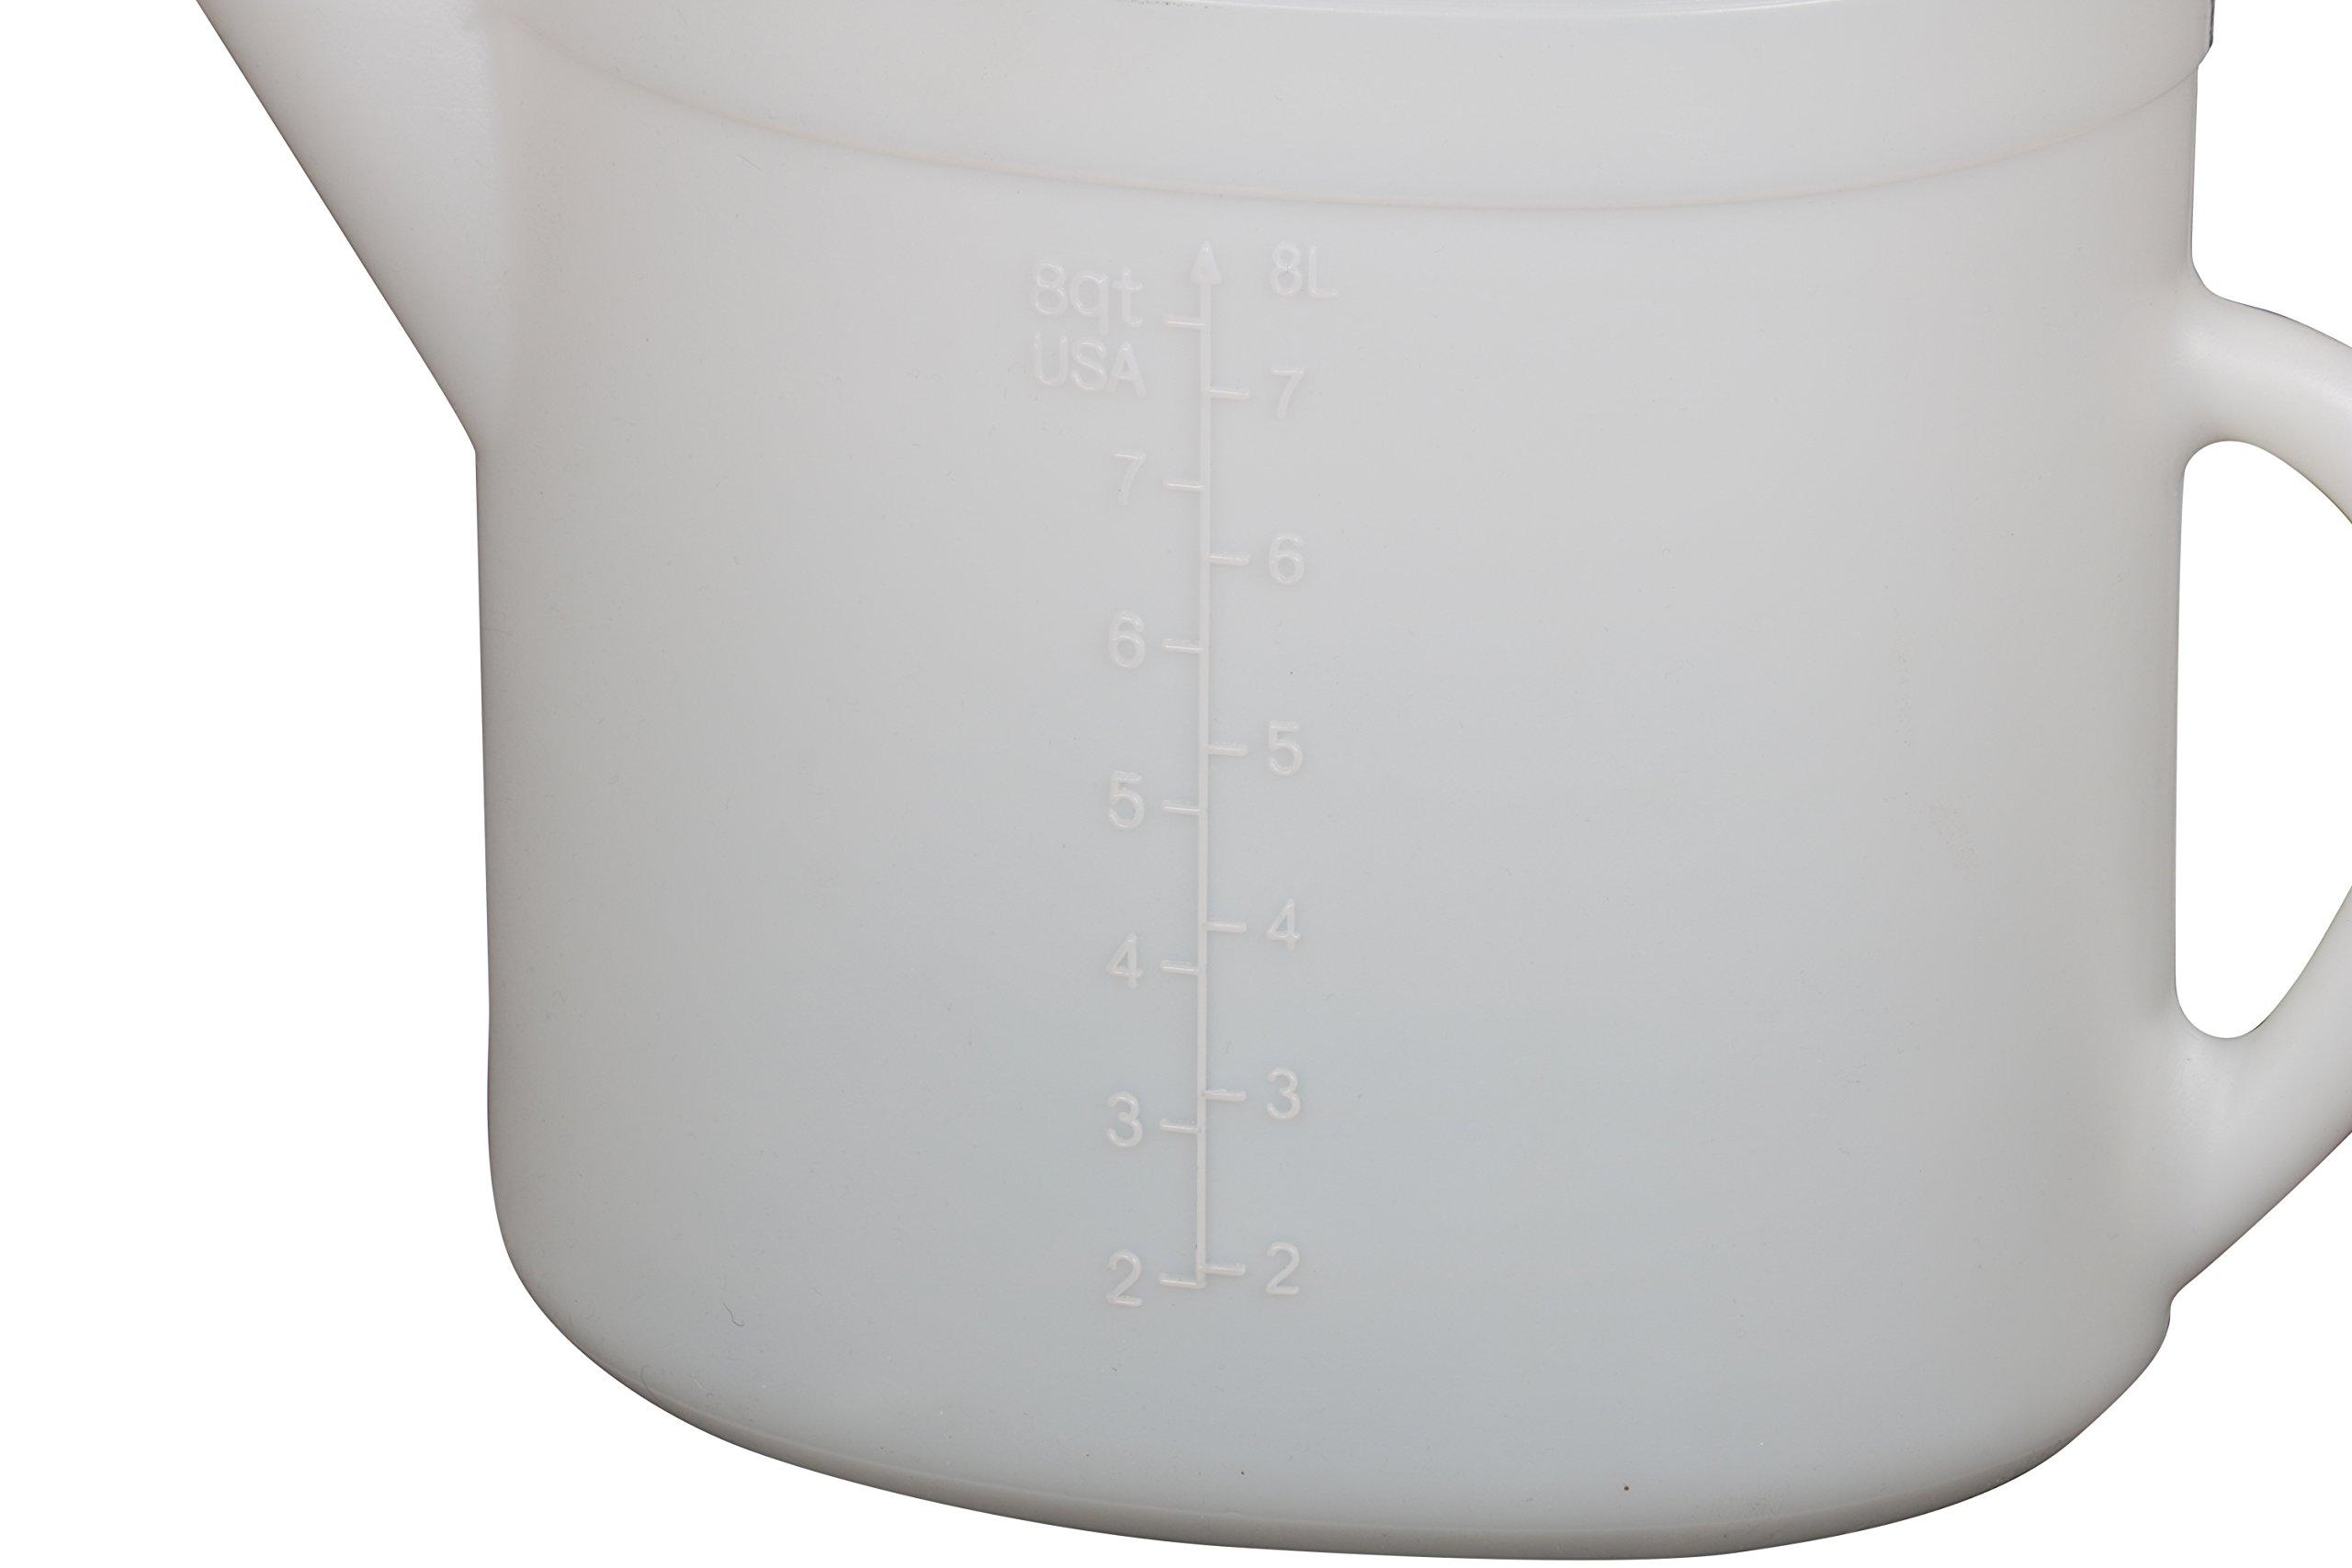 WirthCo 32377 Funnel King High Density Polyethylene Pitcher - 10 Liter Capacity